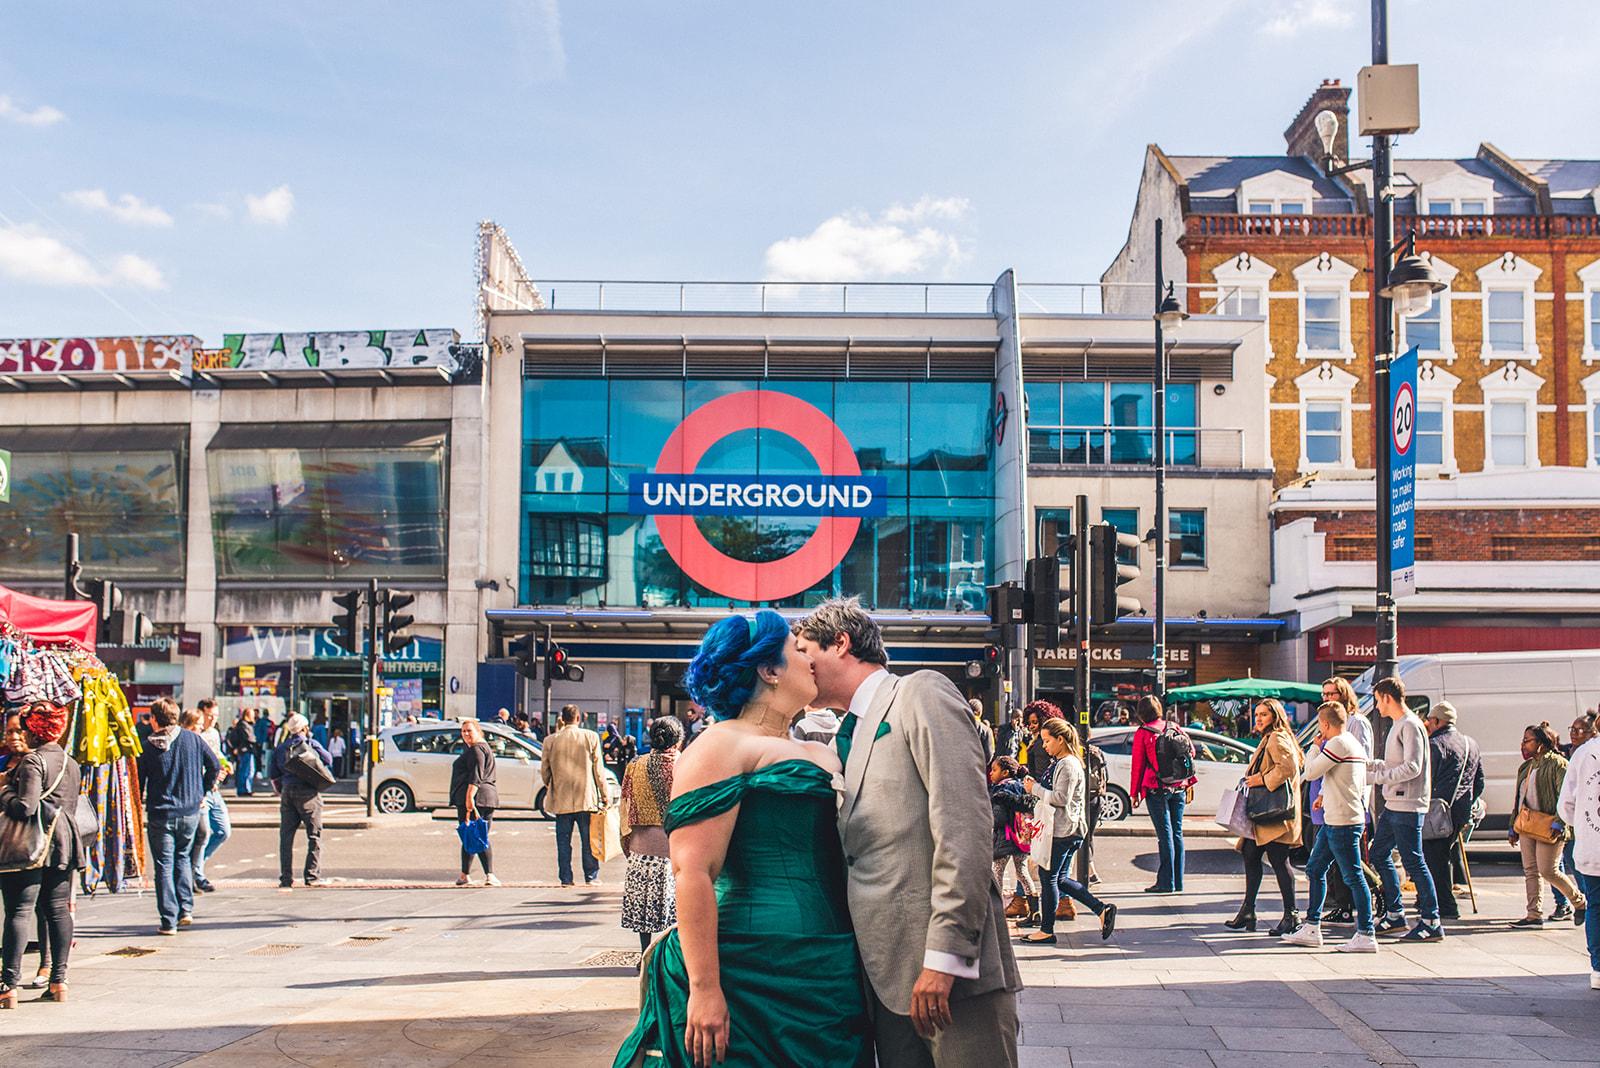 london wedding - wedding photos by the london underground